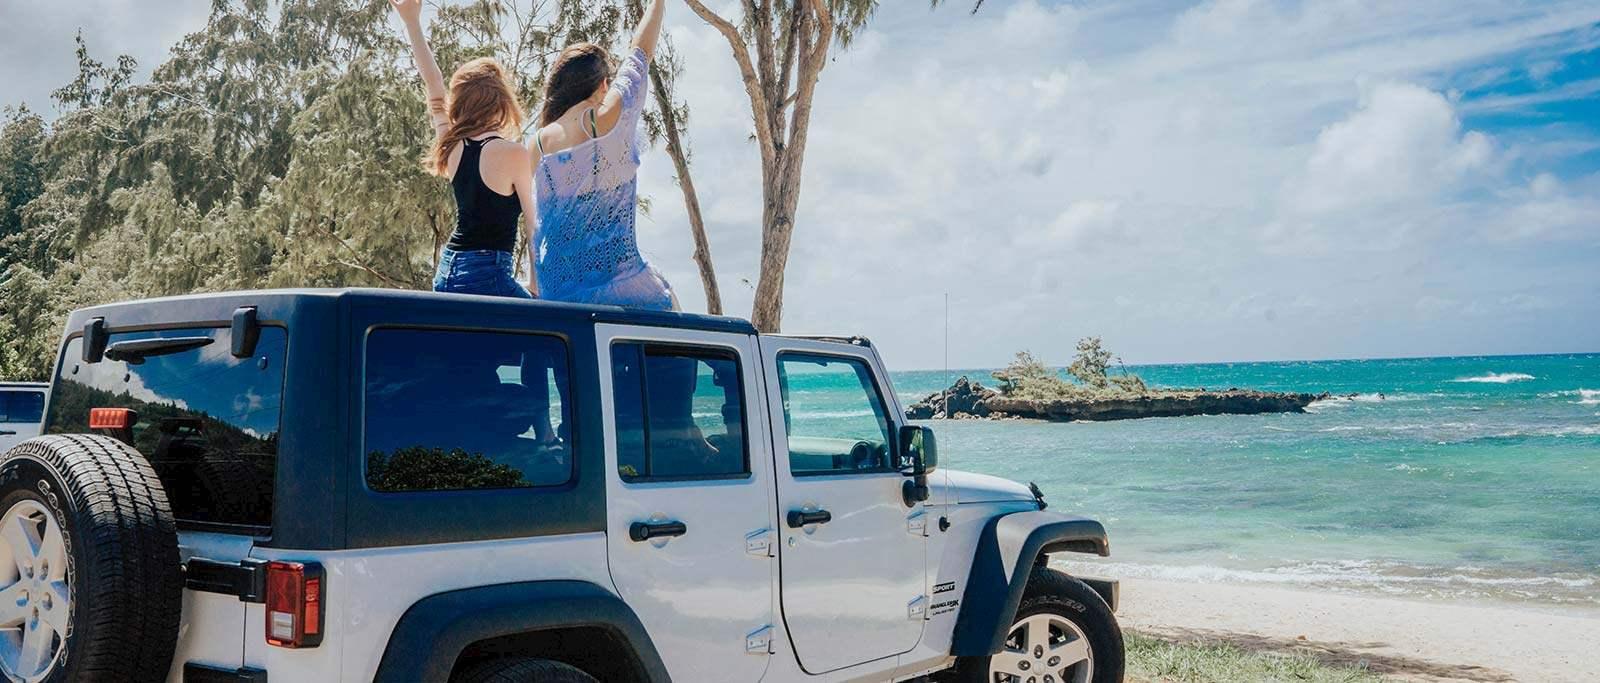 Things To Do in Honolulu Hawaii